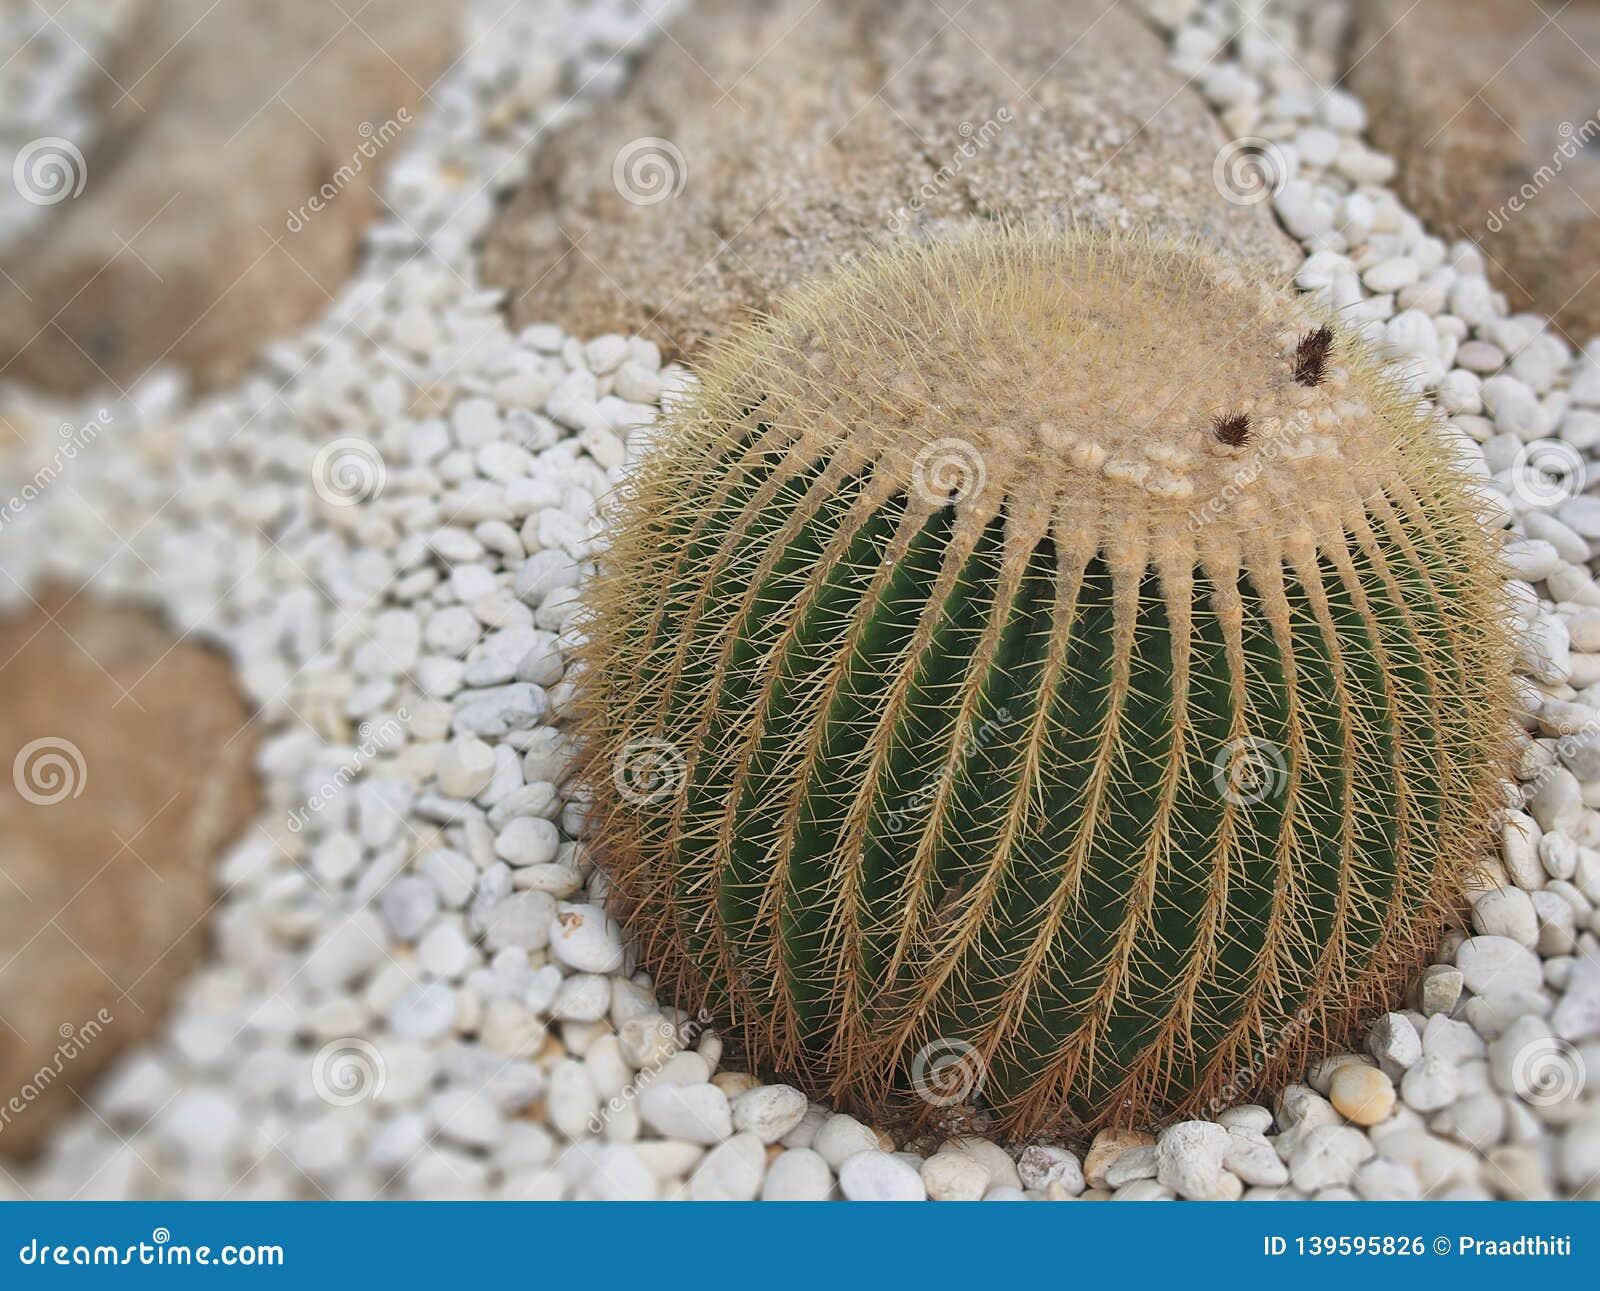 The big ball cactus tree in the garden